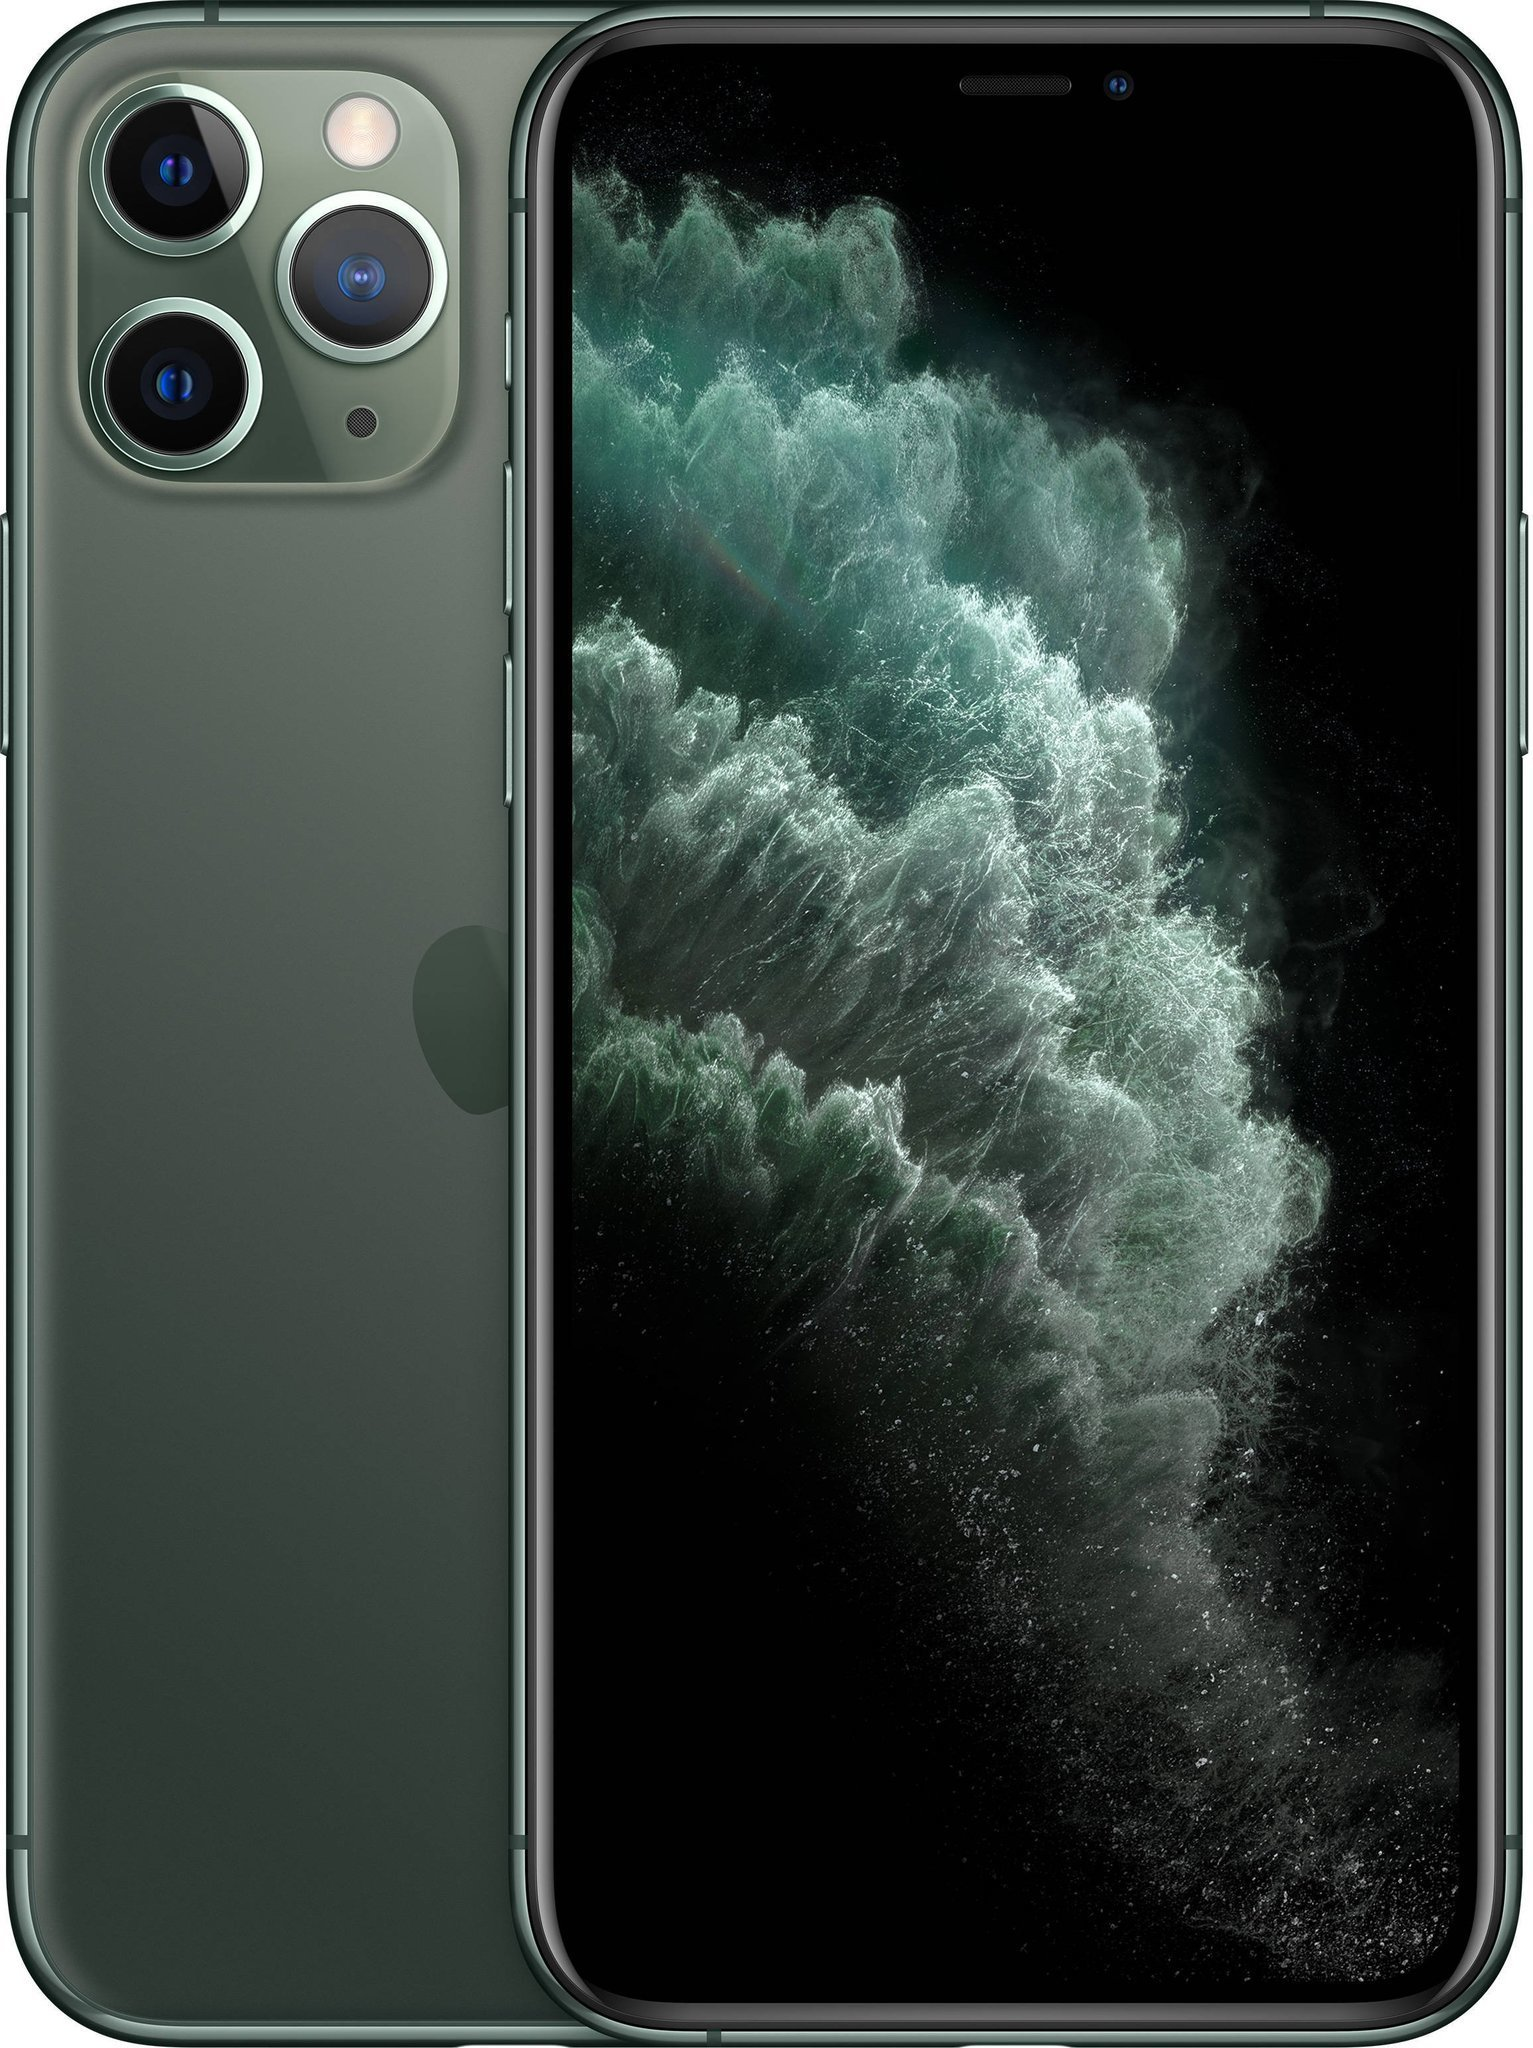 iPhone 11 Pro Max Apple iPhone 11 Pro Max 256gb Темно-зеленый green1.jpg